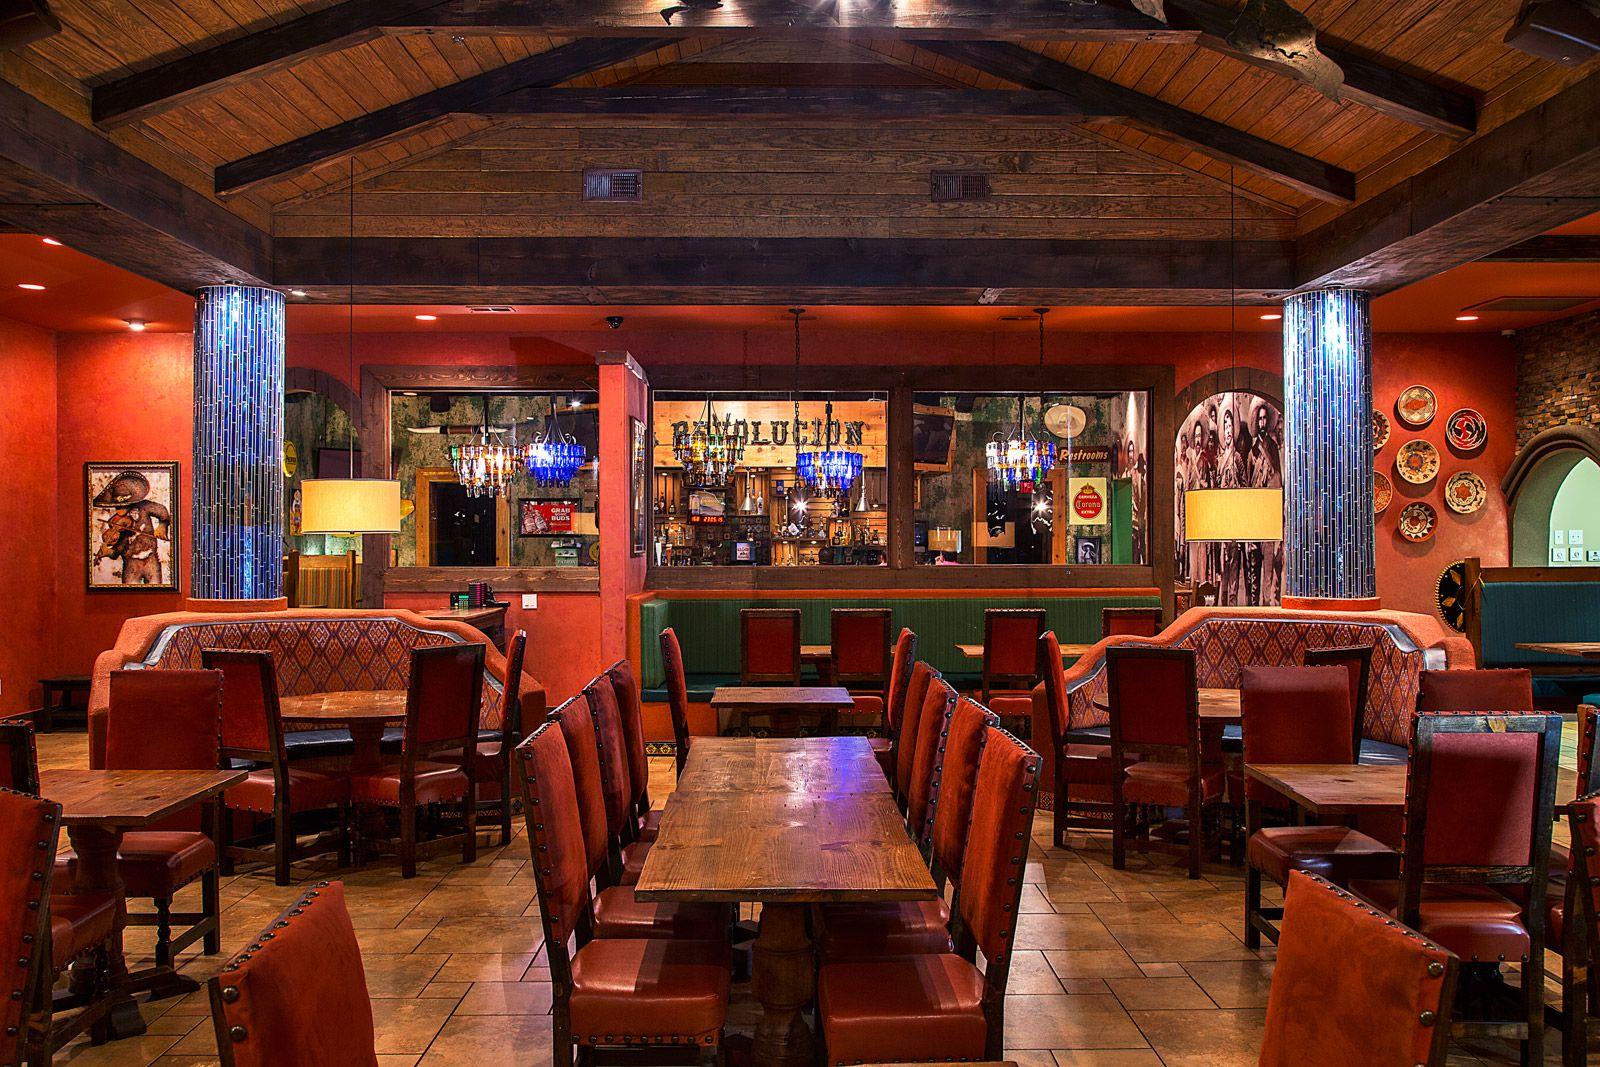 El Cerro Bar Grill Surfside Beach Sc Kimberly Bryant Interior Design Group